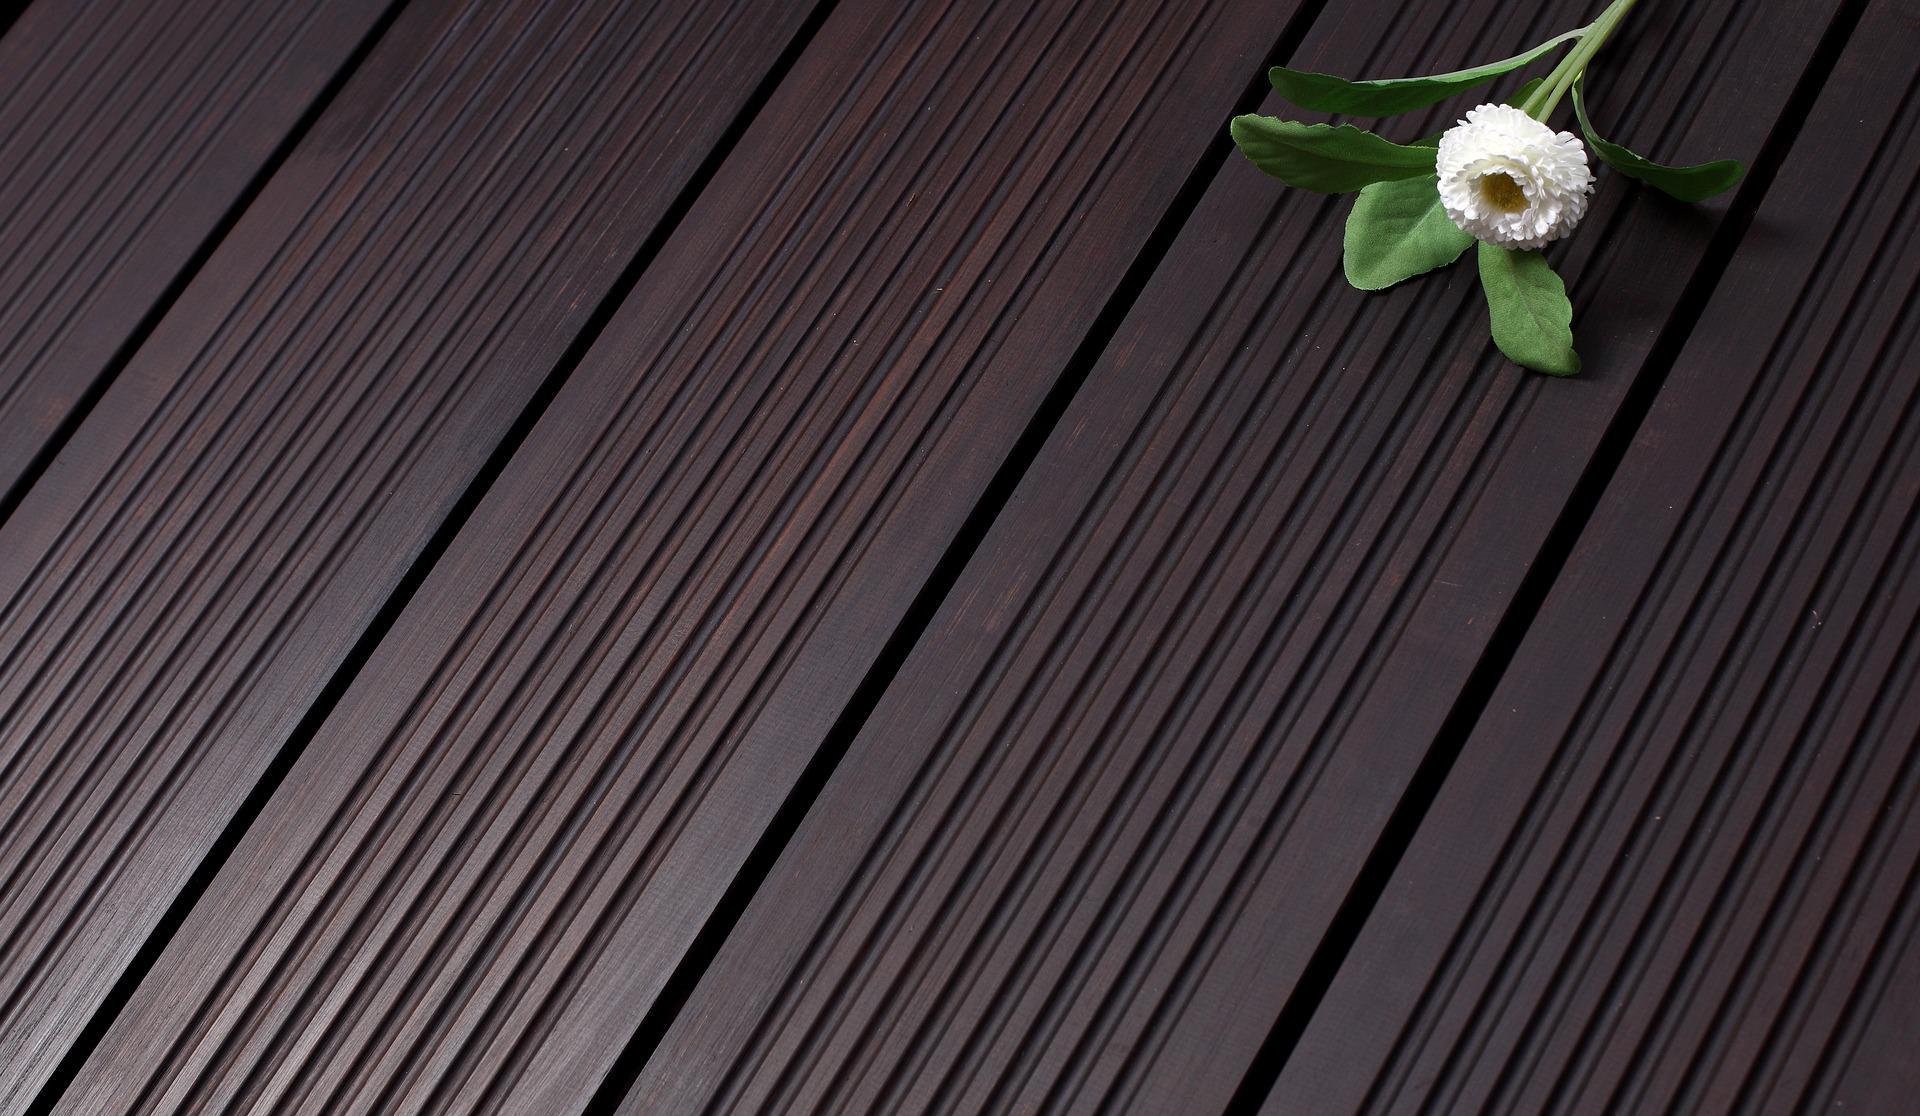 Bamboo flooring is an ecological choice